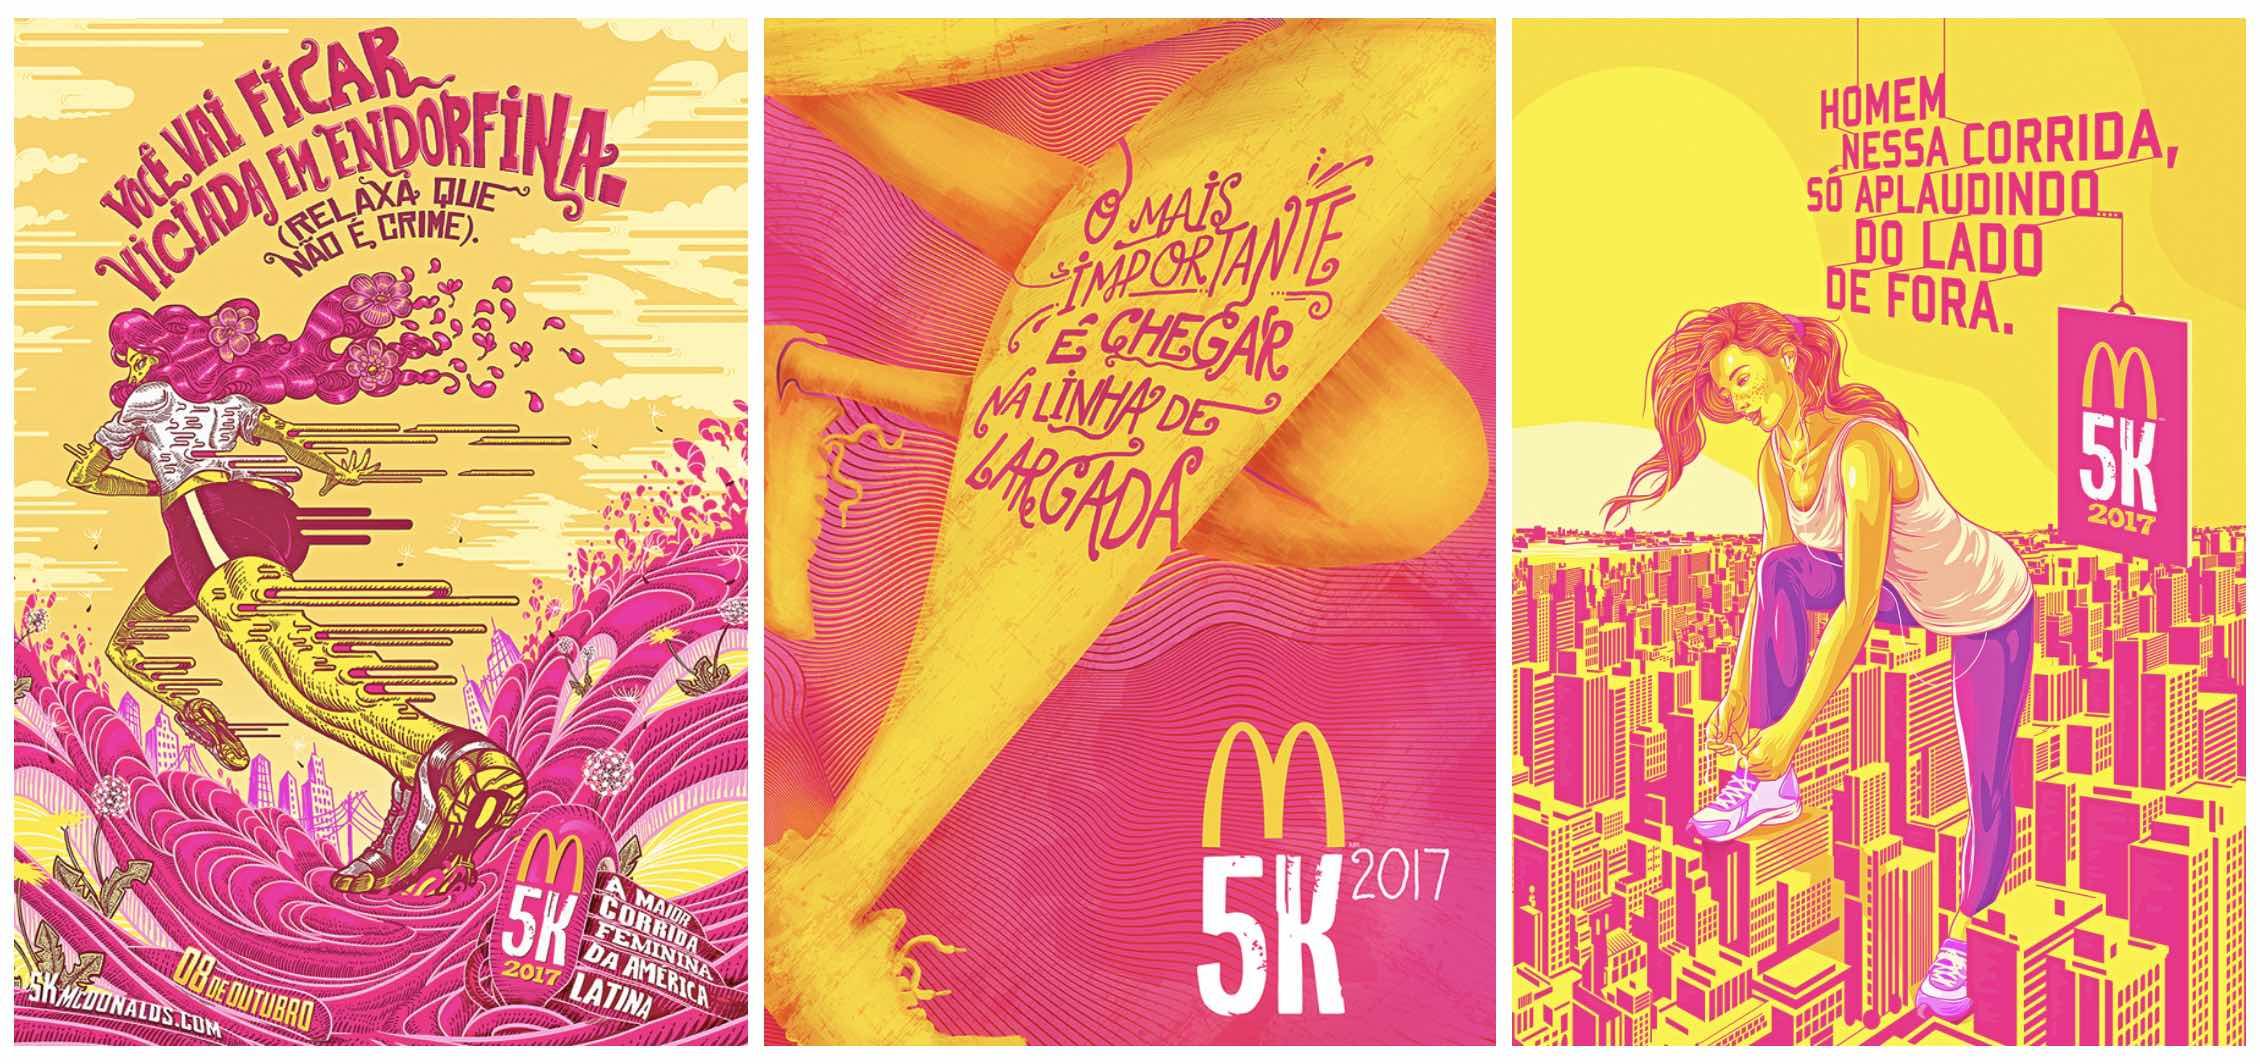 McDonalds M5K Marcelo Maciel 03